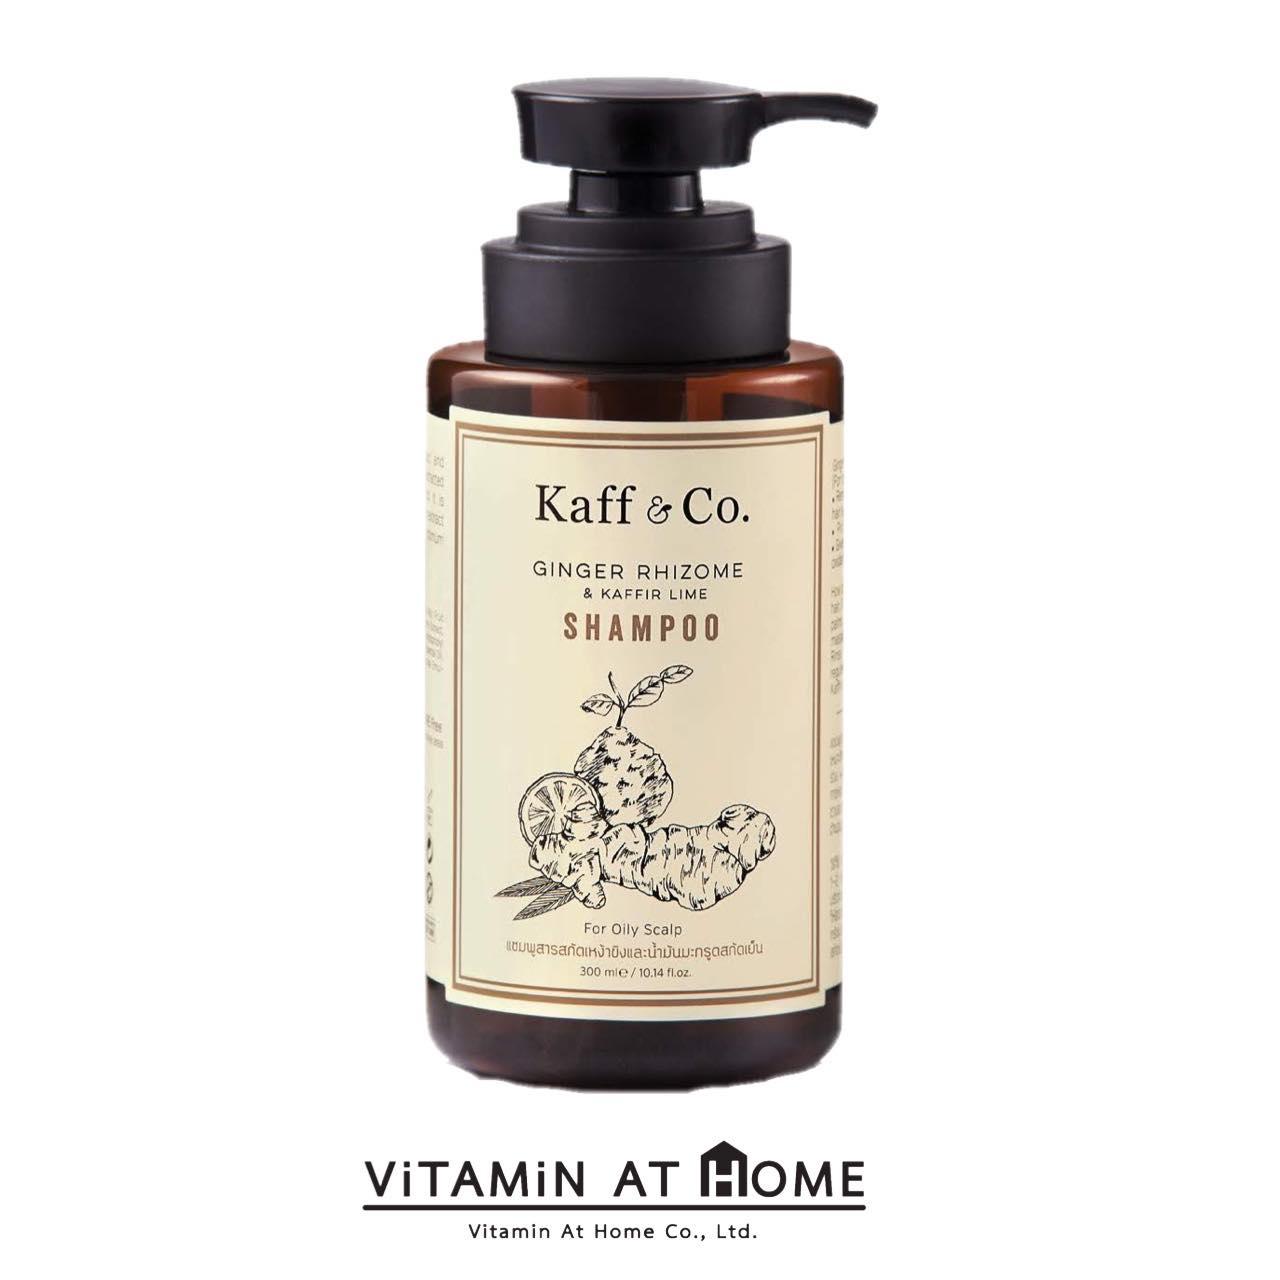 Kaff&Co. 300 ML แชมพูสารสกัดเหง้าขิง น้ำมันมะกรูดสกัดเย็น Ginger Rhizome & Kaffir Lime shampoo